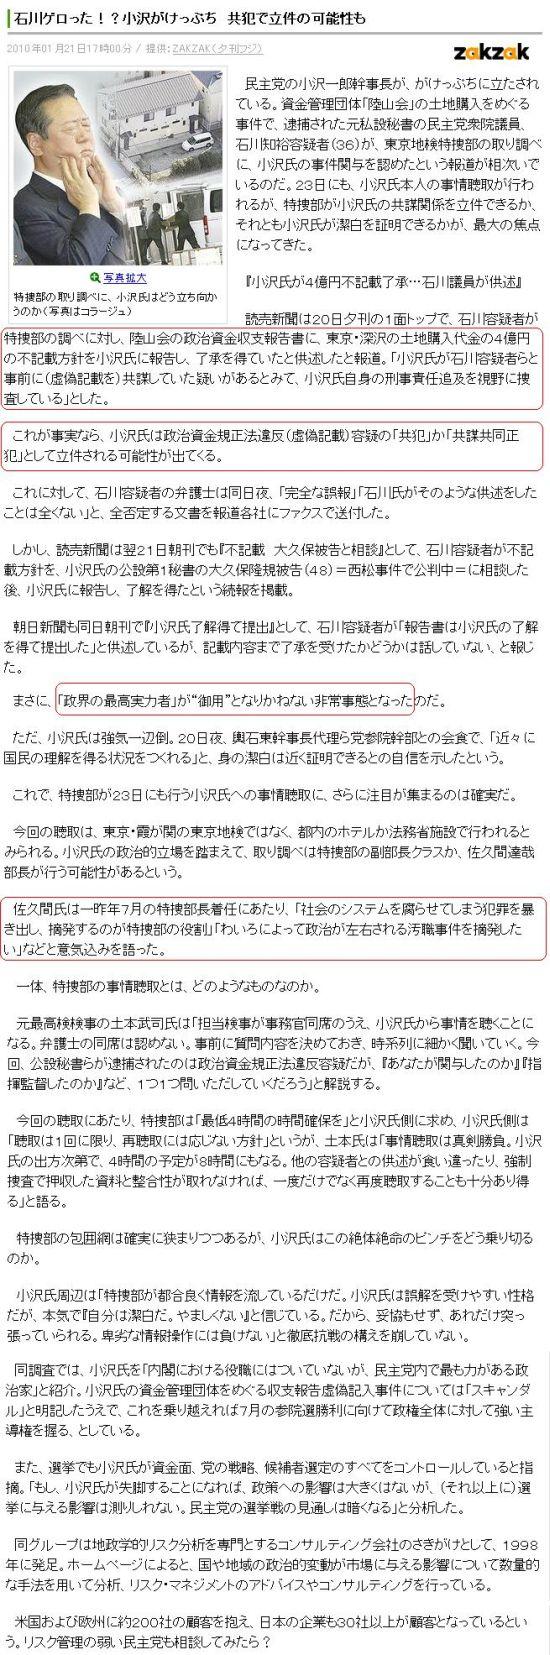 20100121ishikawa.jpg